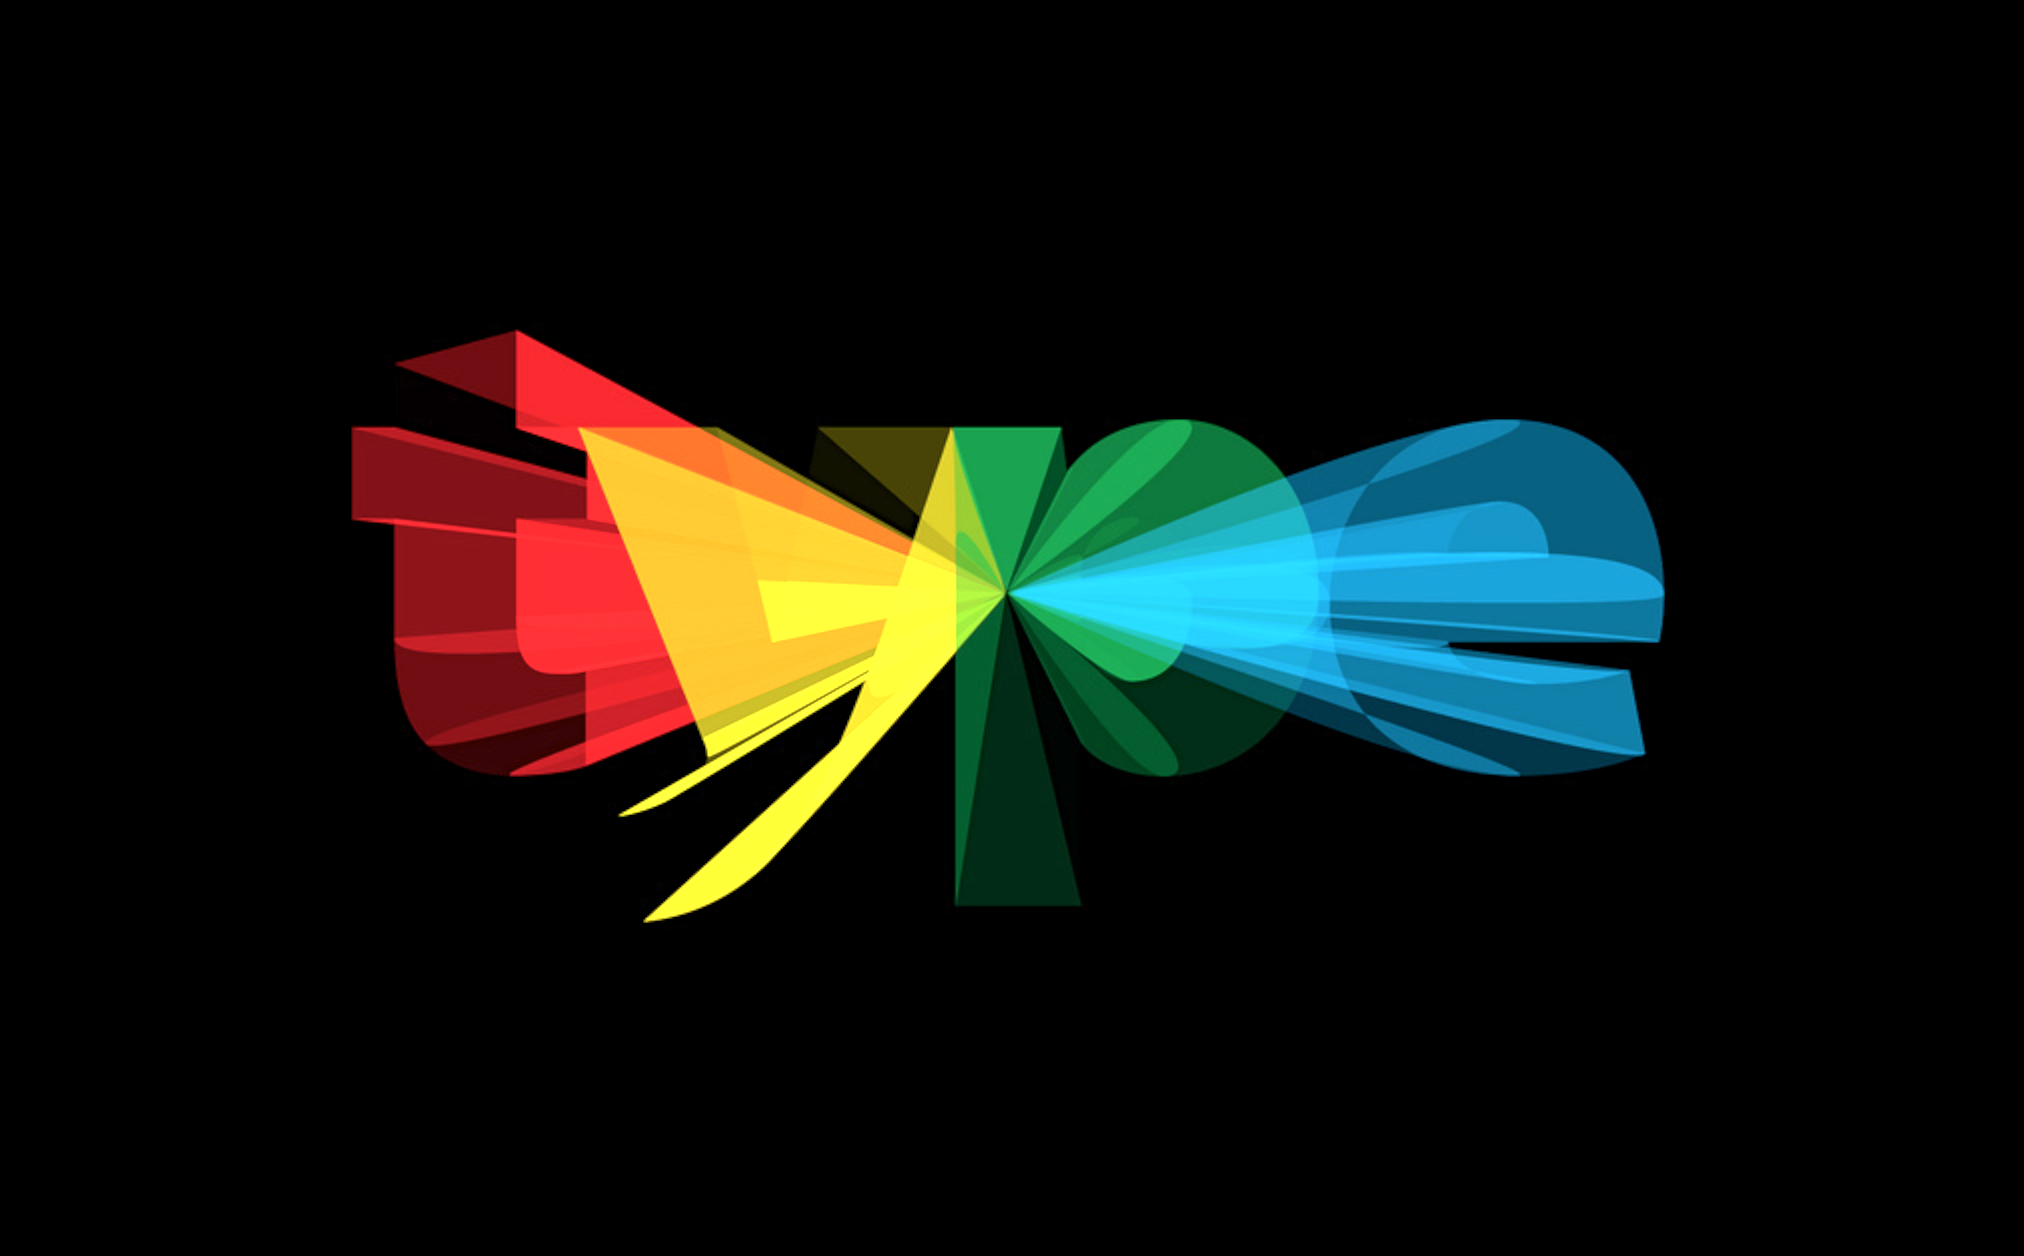 ... Impact on Graphic Design, Web Design and Brand Identity